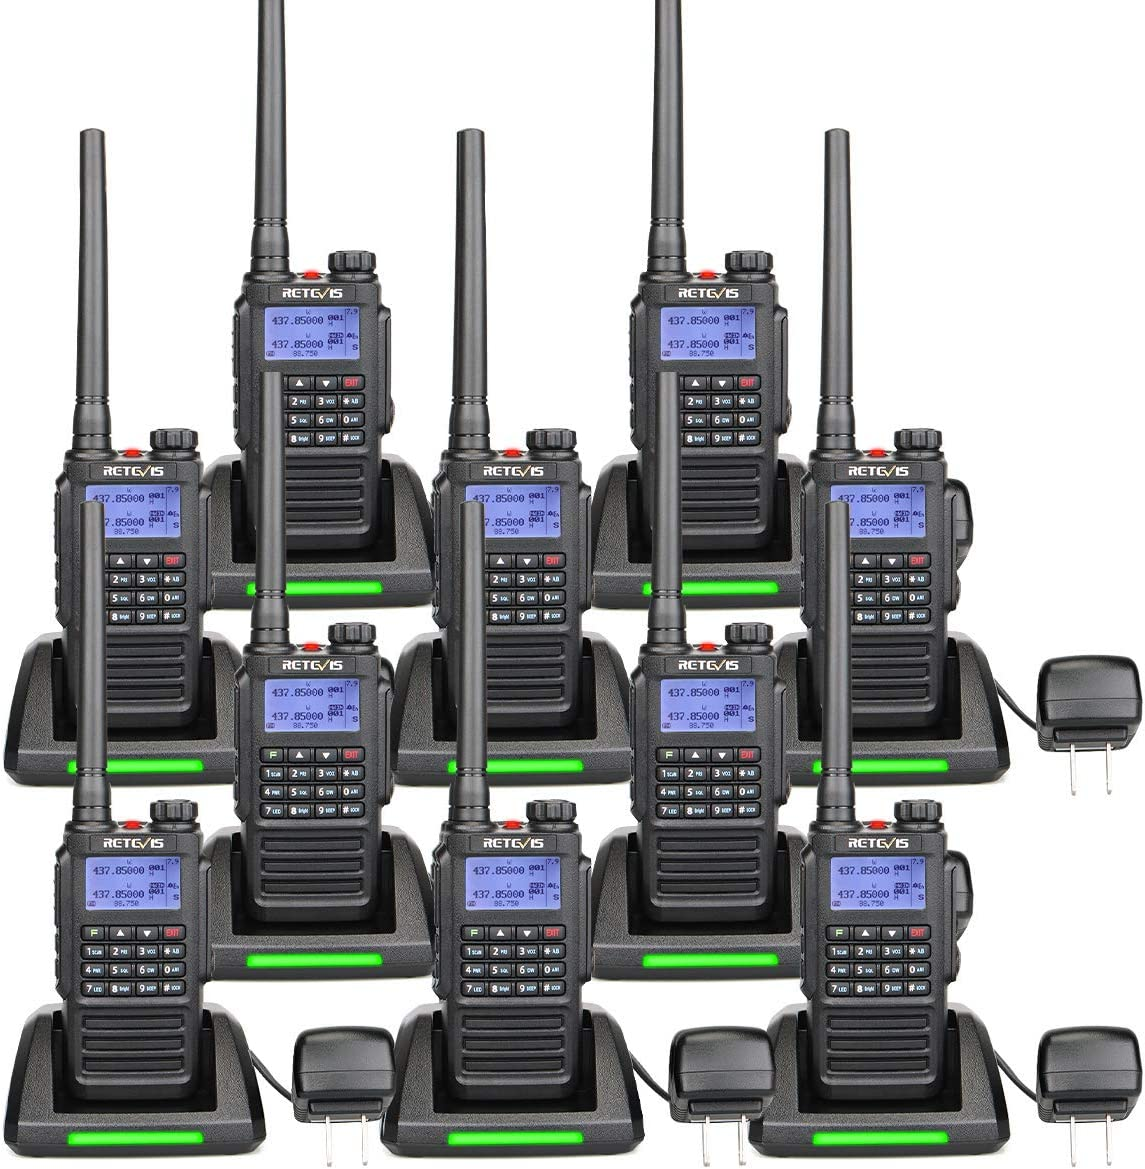 Retevis RT87 2 Way Radios Walkie Talkies Long Range,VHF UHF Dual Band High Power, Waterproof Walkie Talkie for Heavy Duty Business Environment